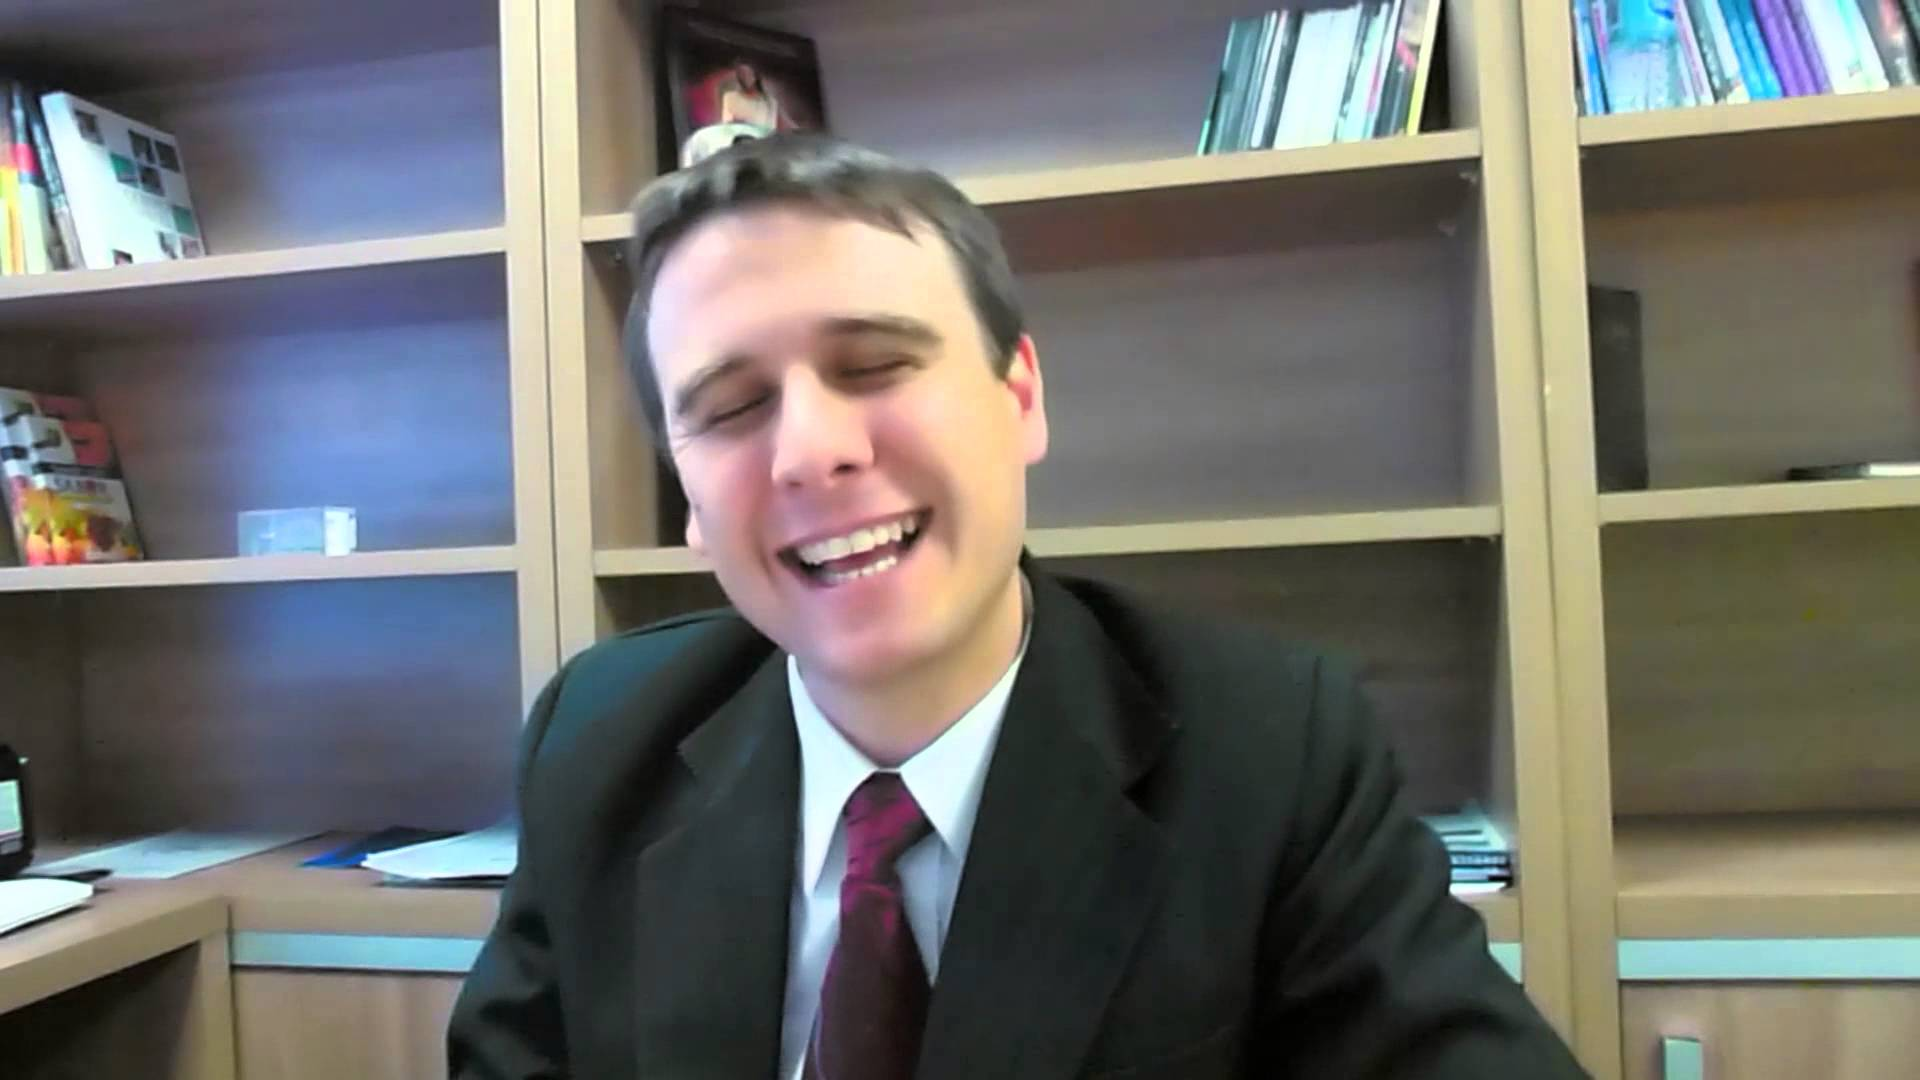 Adrian Peto – Serviço Voluntário Adventista